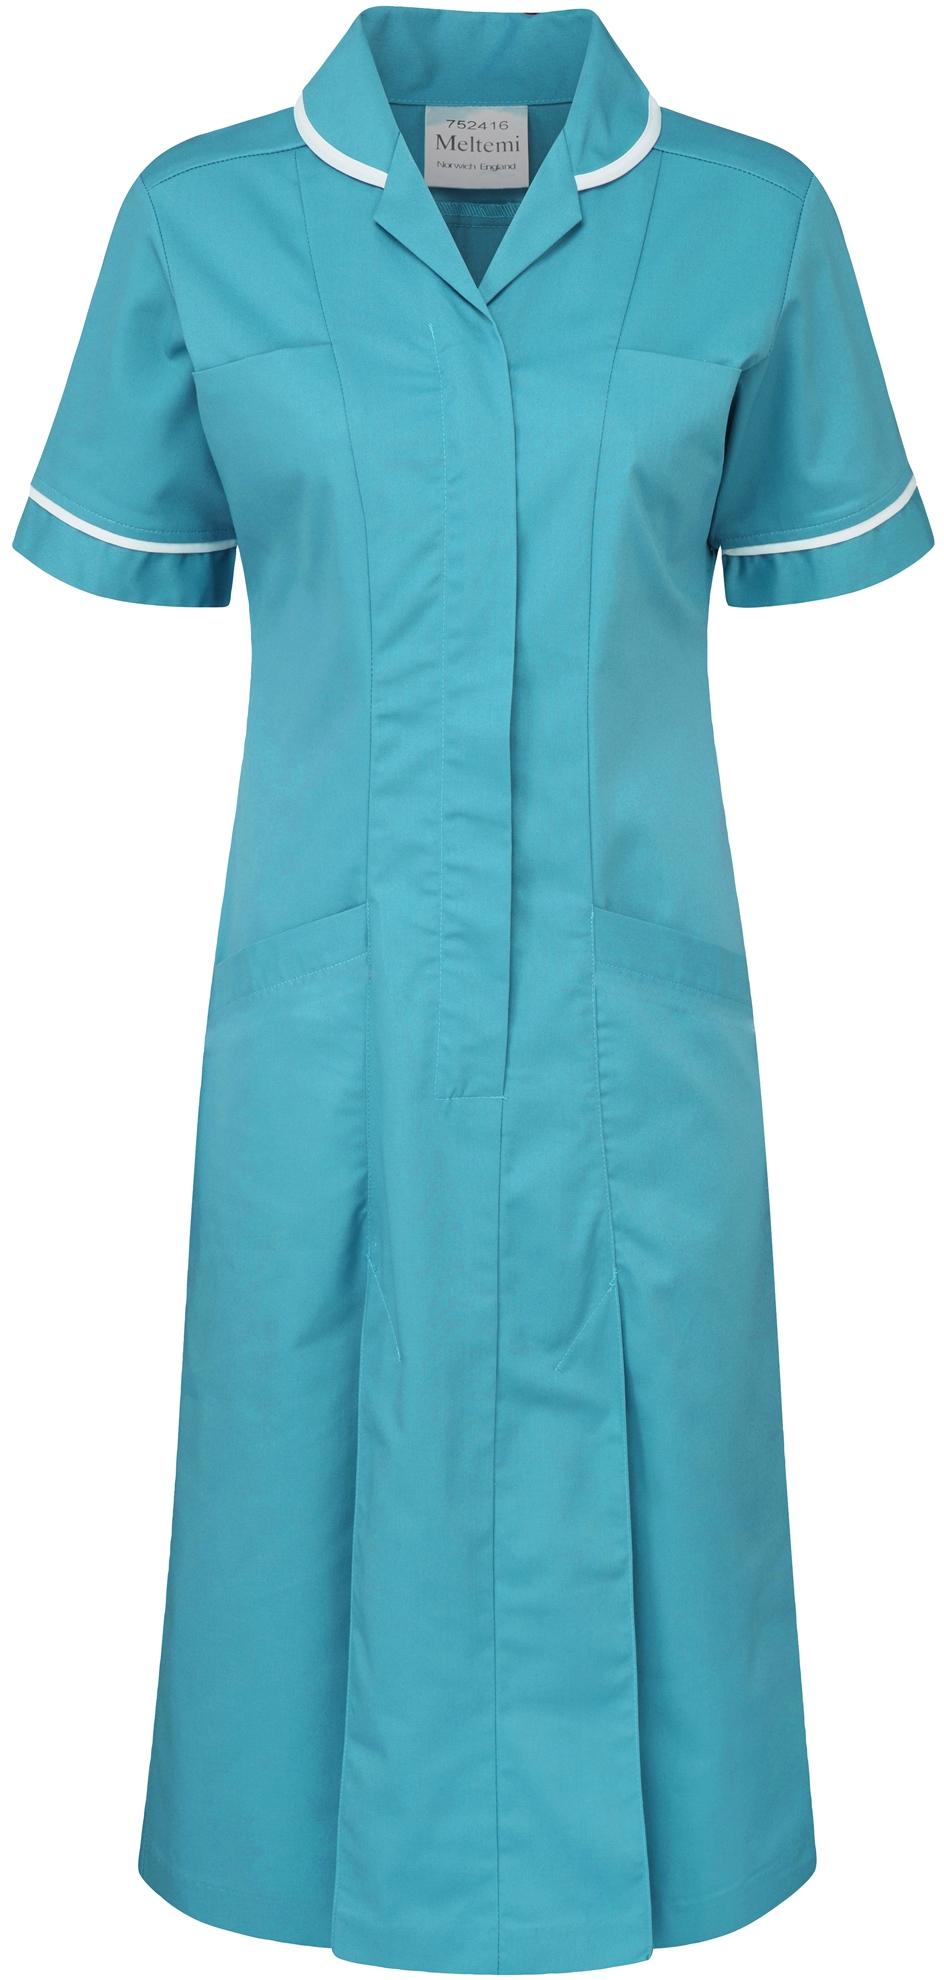 Picture of Plain Colour Dress - Aquamarine/White